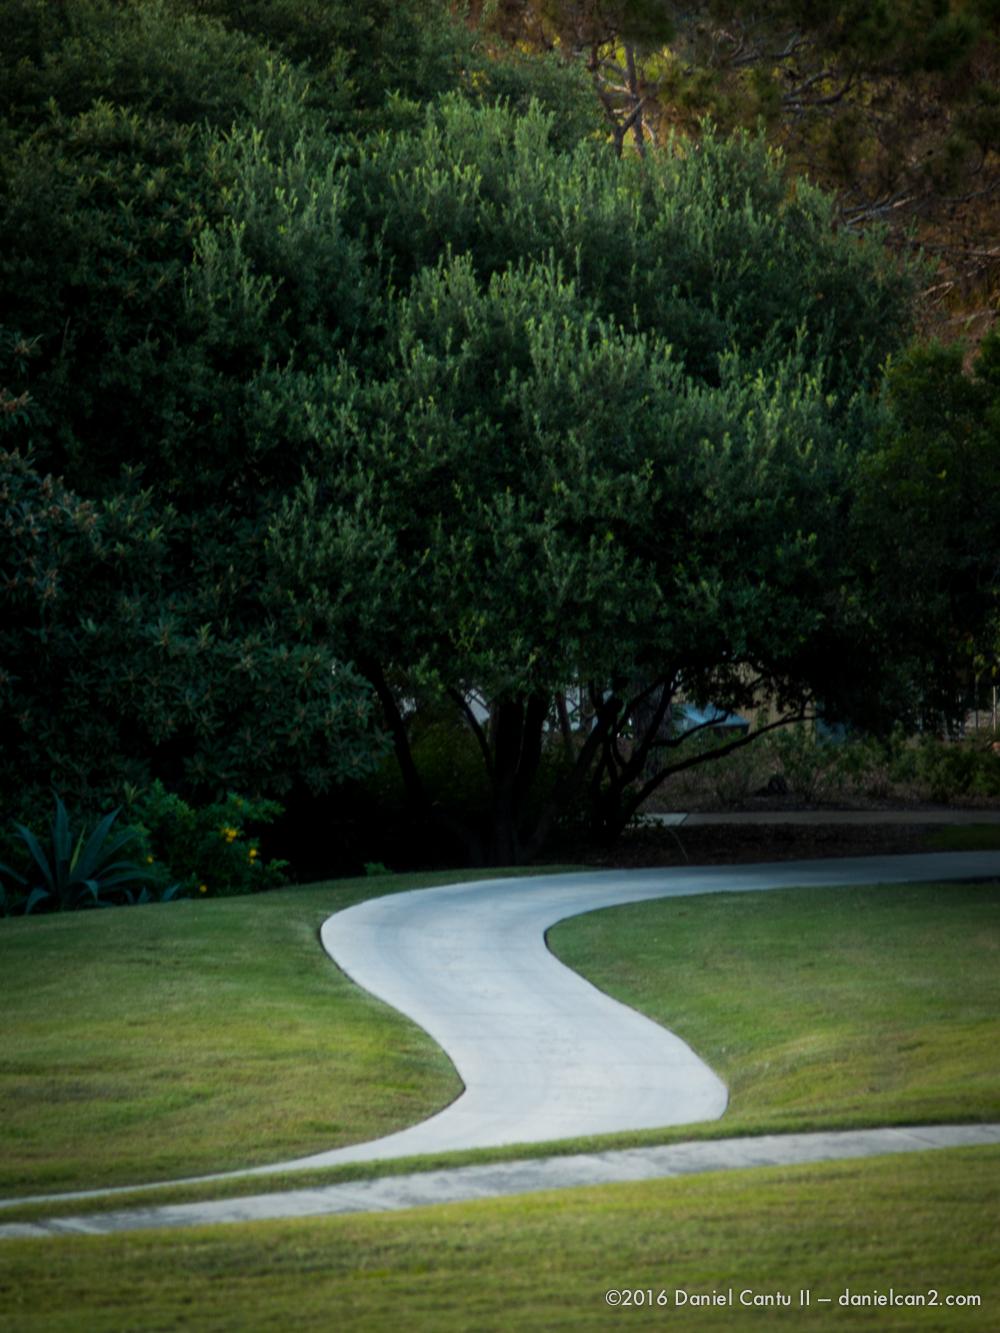 Daniel-Cantu-II-Botanical-Gardens-Oct-2016-57.jpg